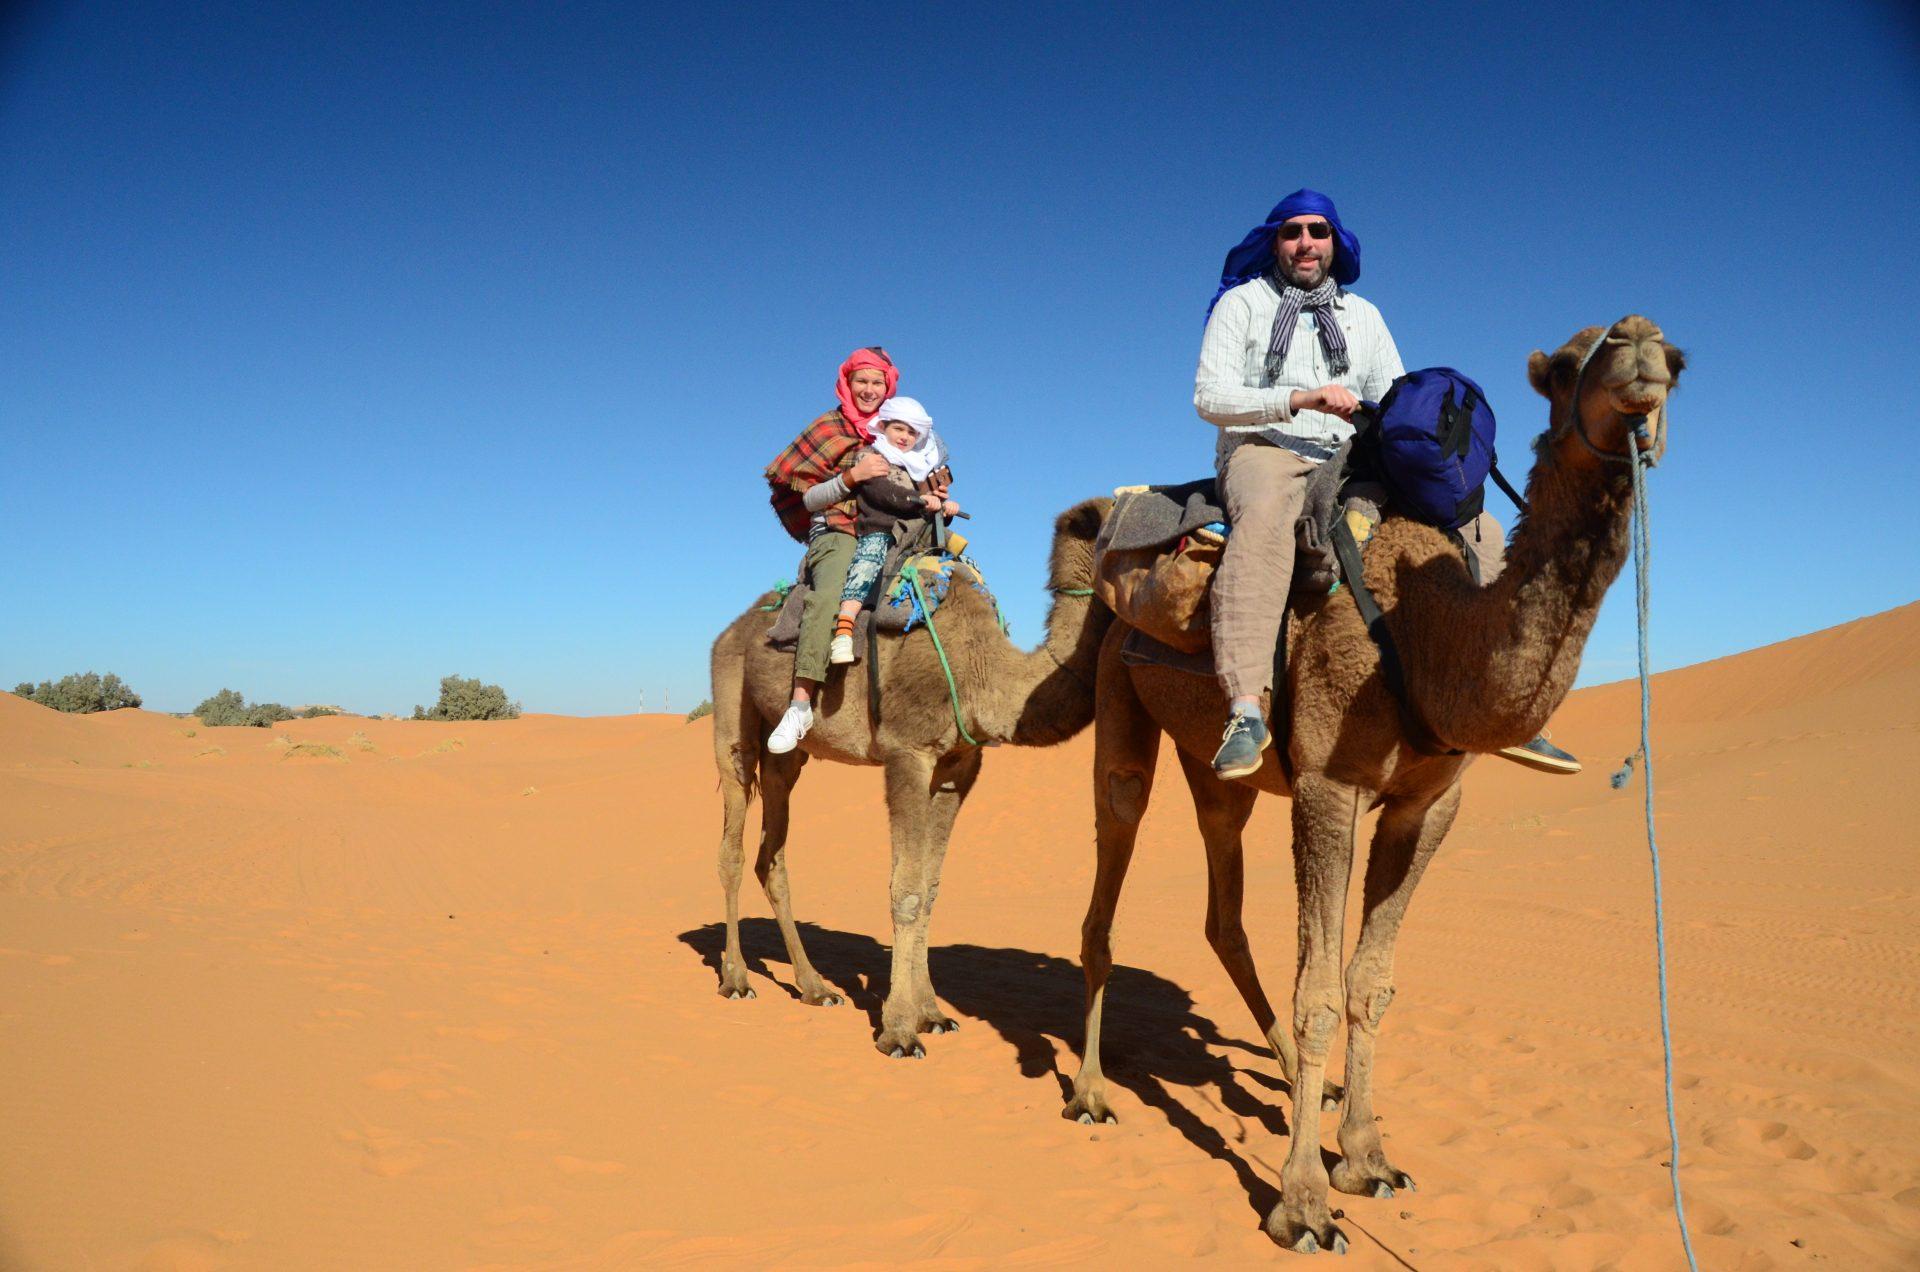 Morocco | Sahara Desert Adventure With Kids